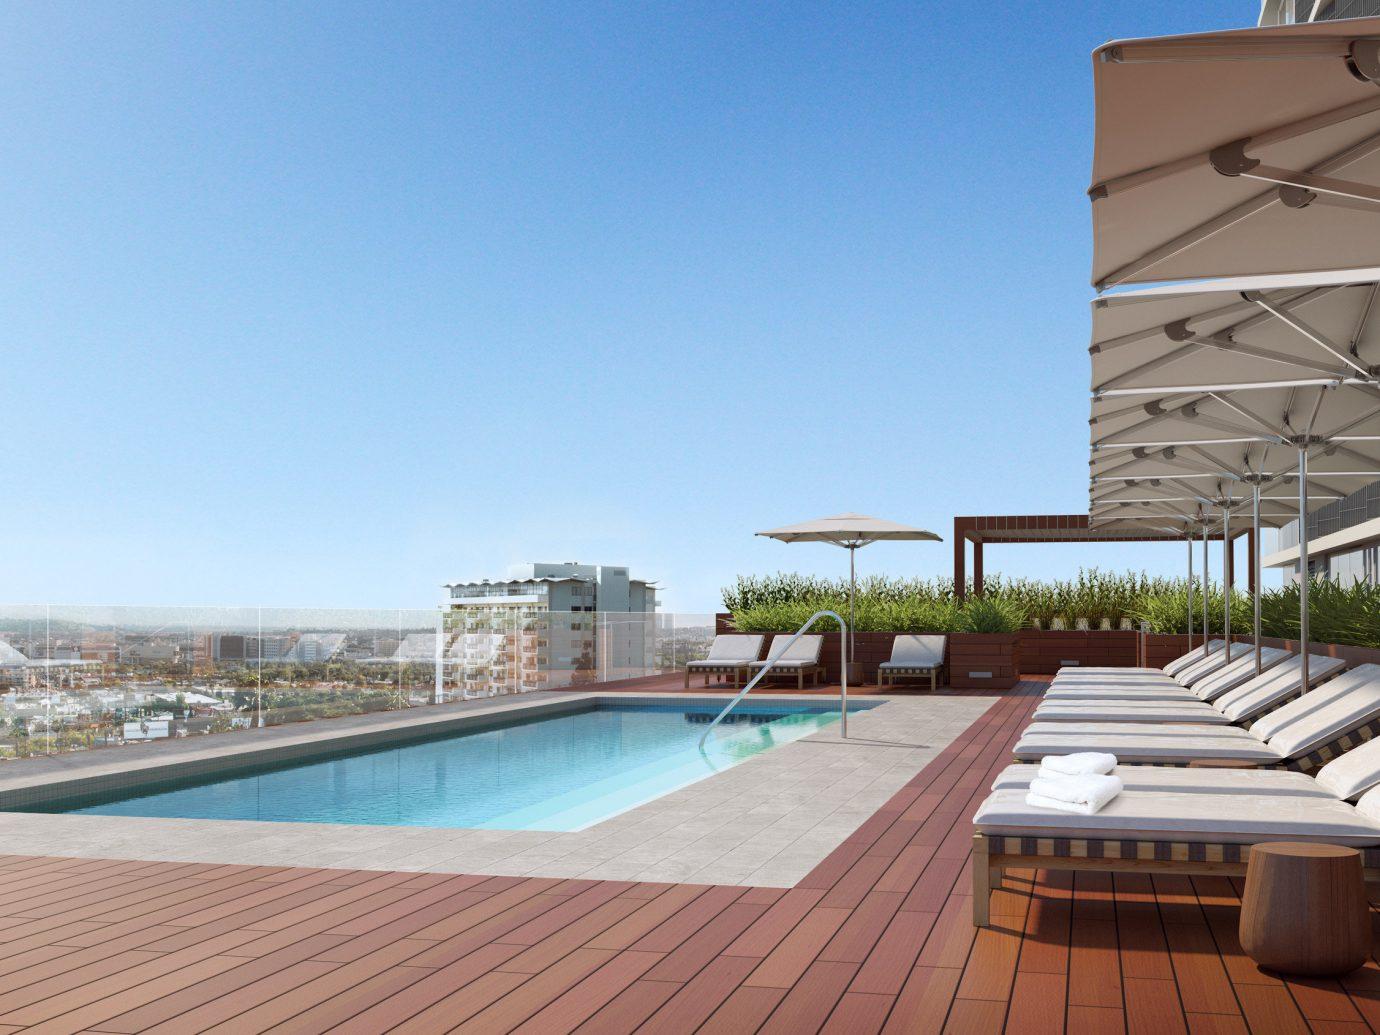 Hotels sky outdoor swimming pool property leisure building condominium real estate Villa estate outdoor structure Resort apartment